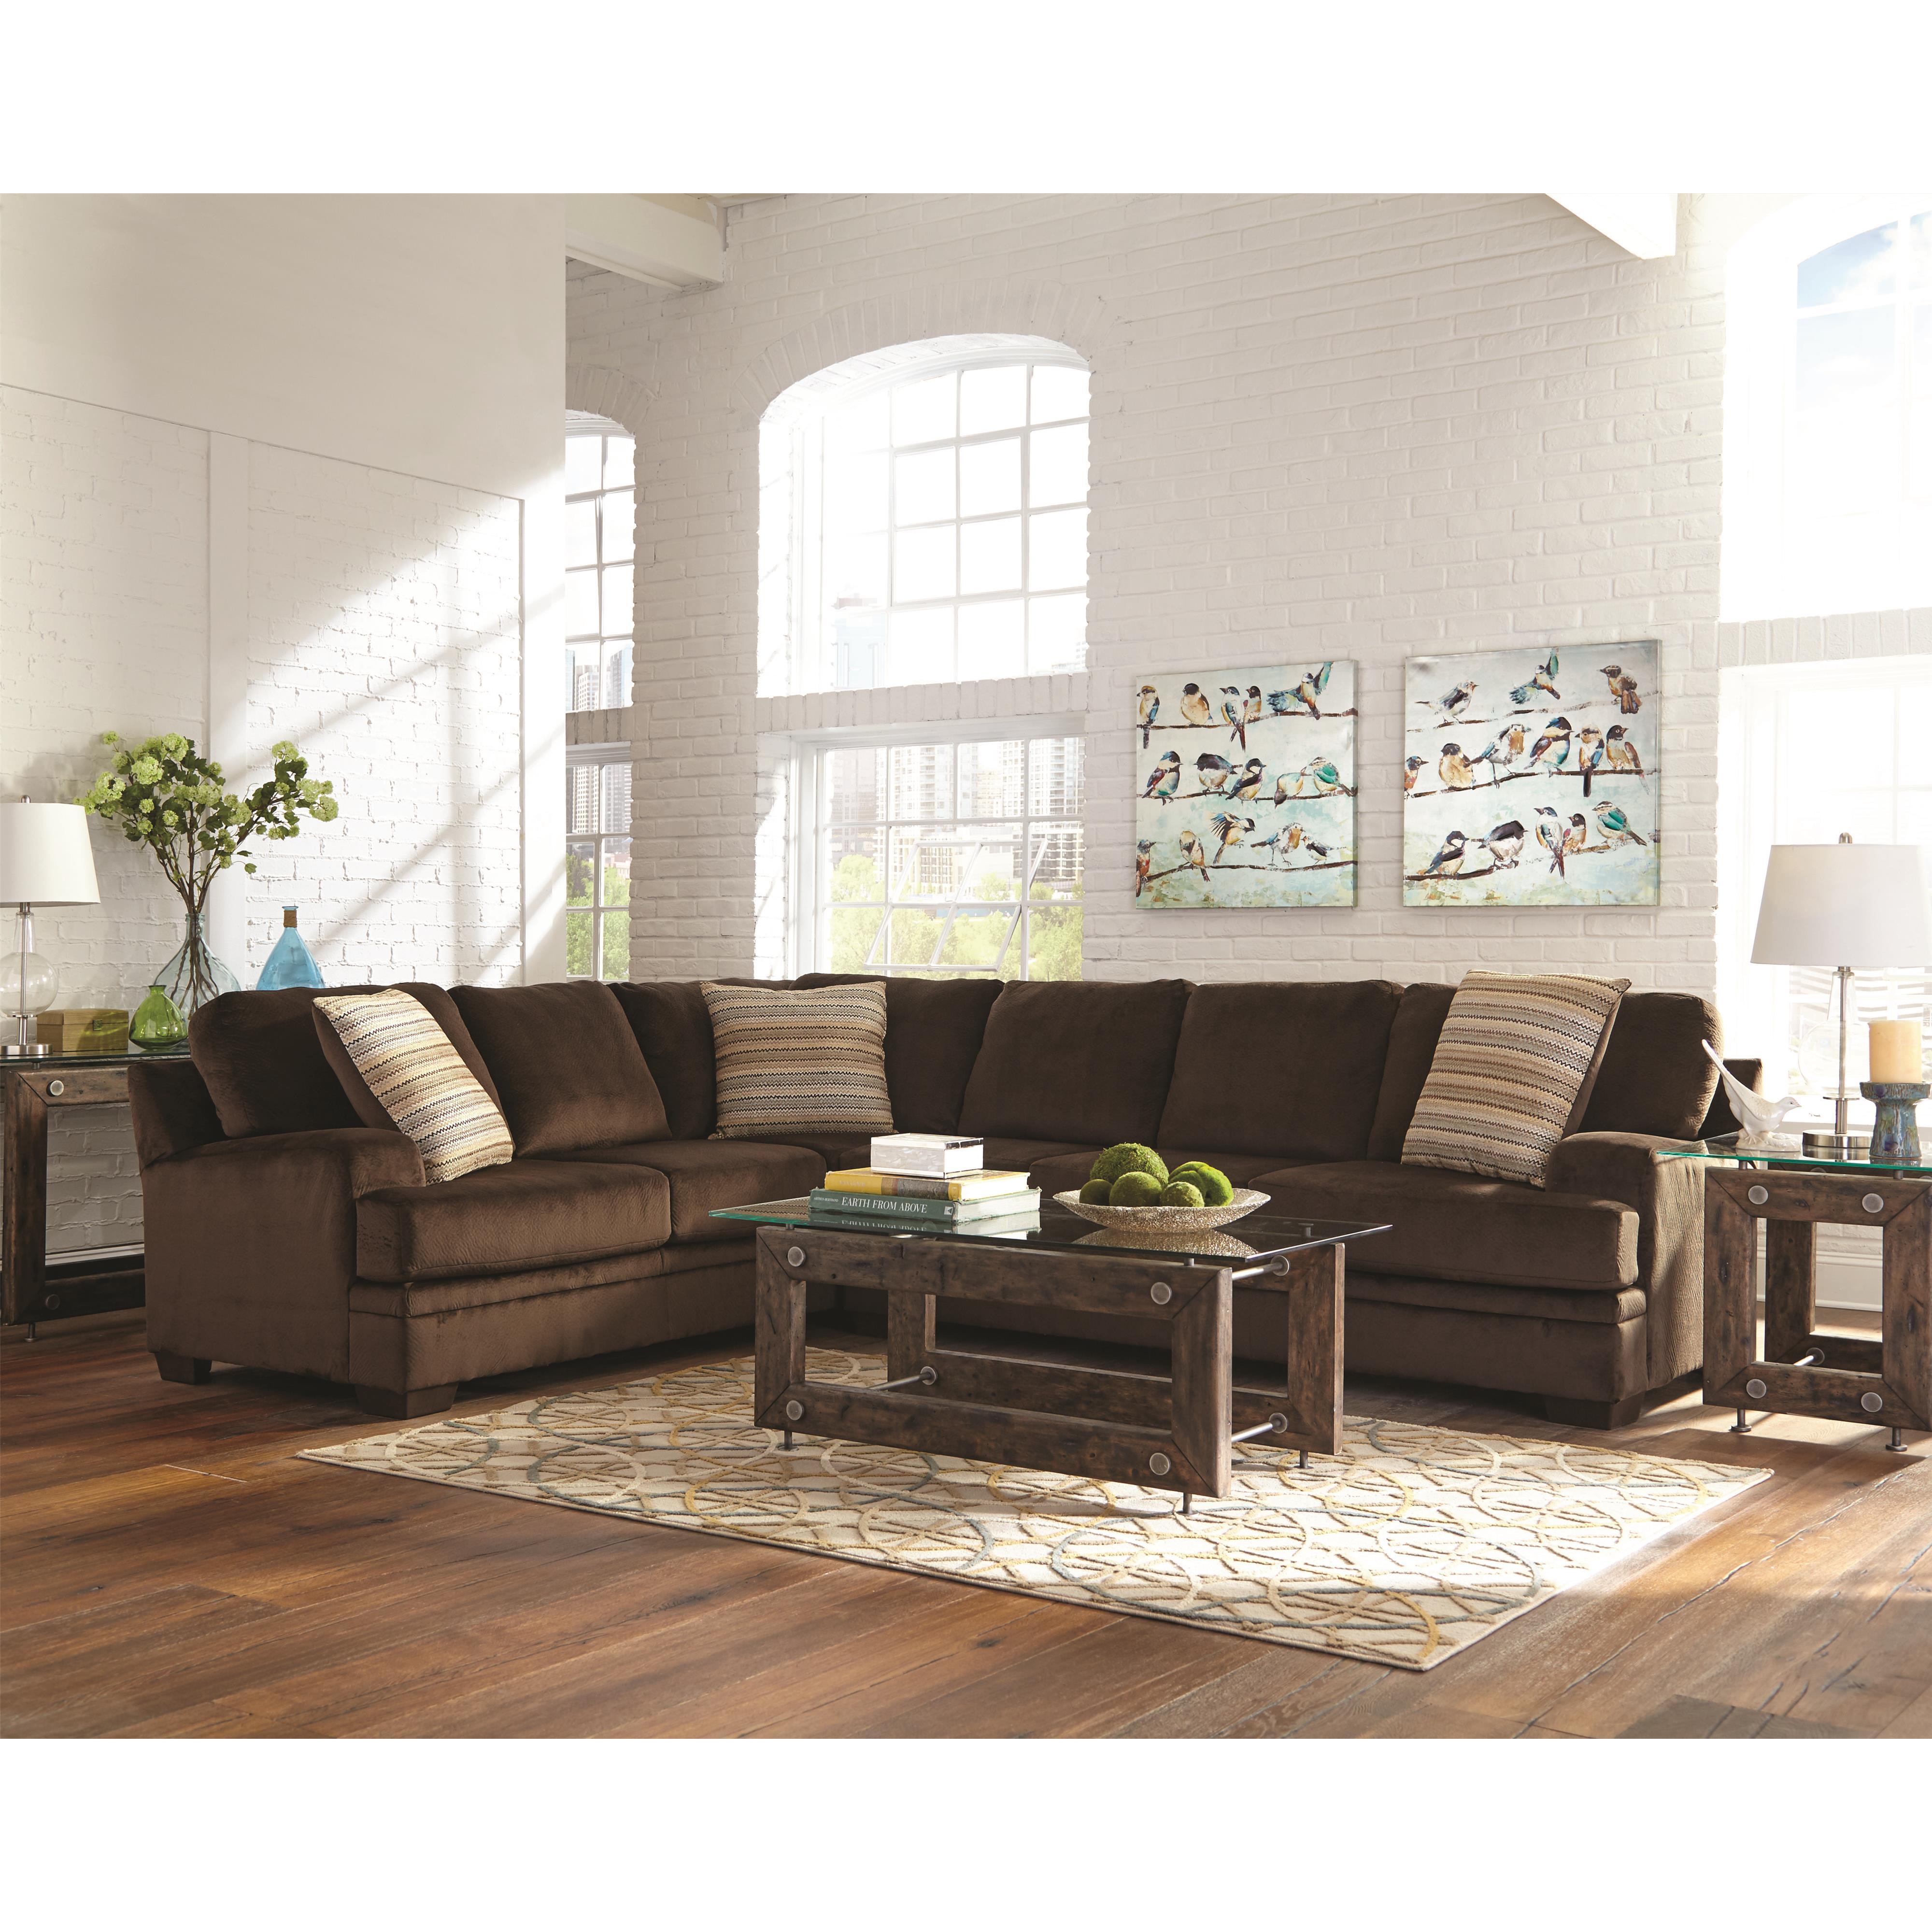 Robion Dark Brown Plush Corner Sectional Quality